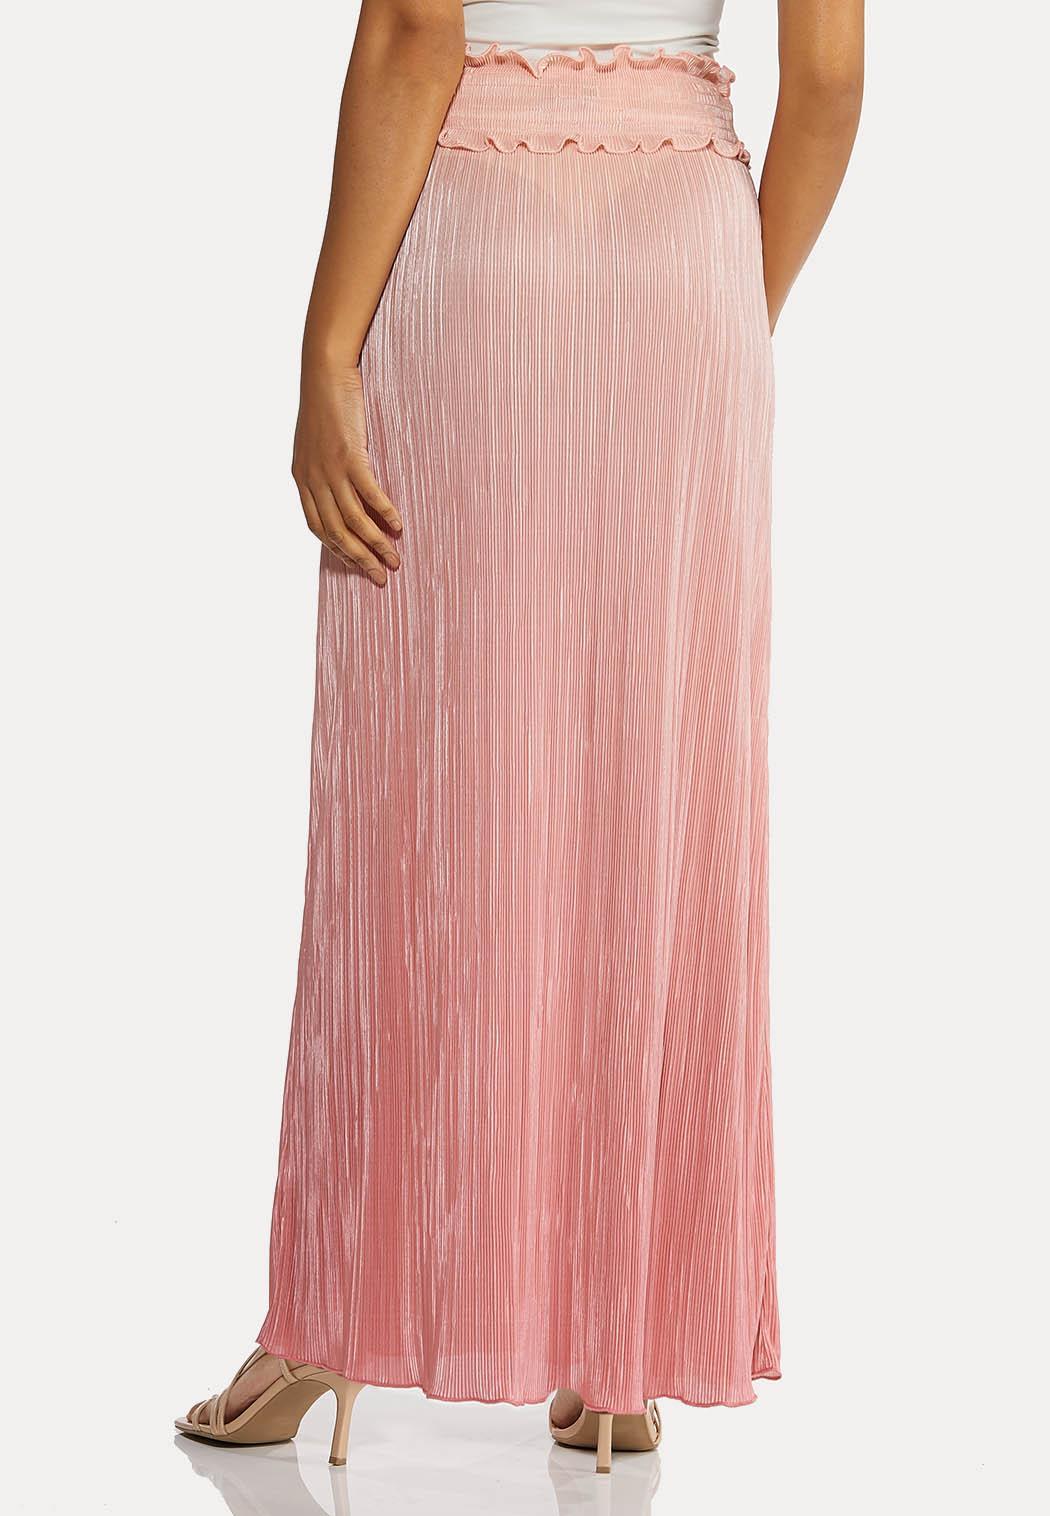 Plus Size Blush Pleated Maxi Skirt (Item #44196707)